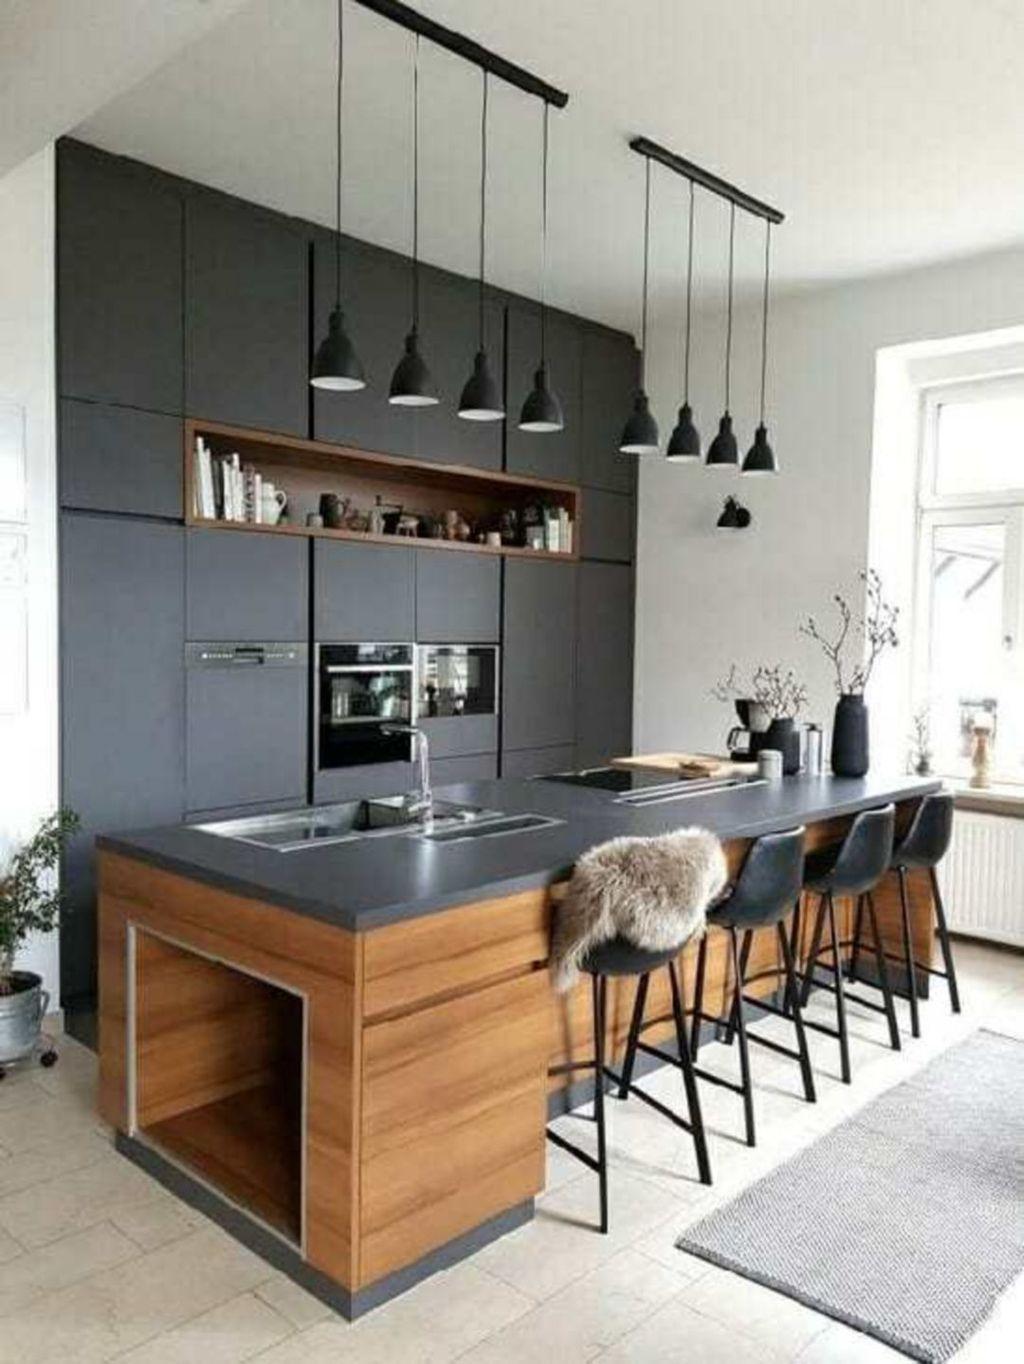 Modern Minimalist Kitchen Design Makes The House Look Elegant18